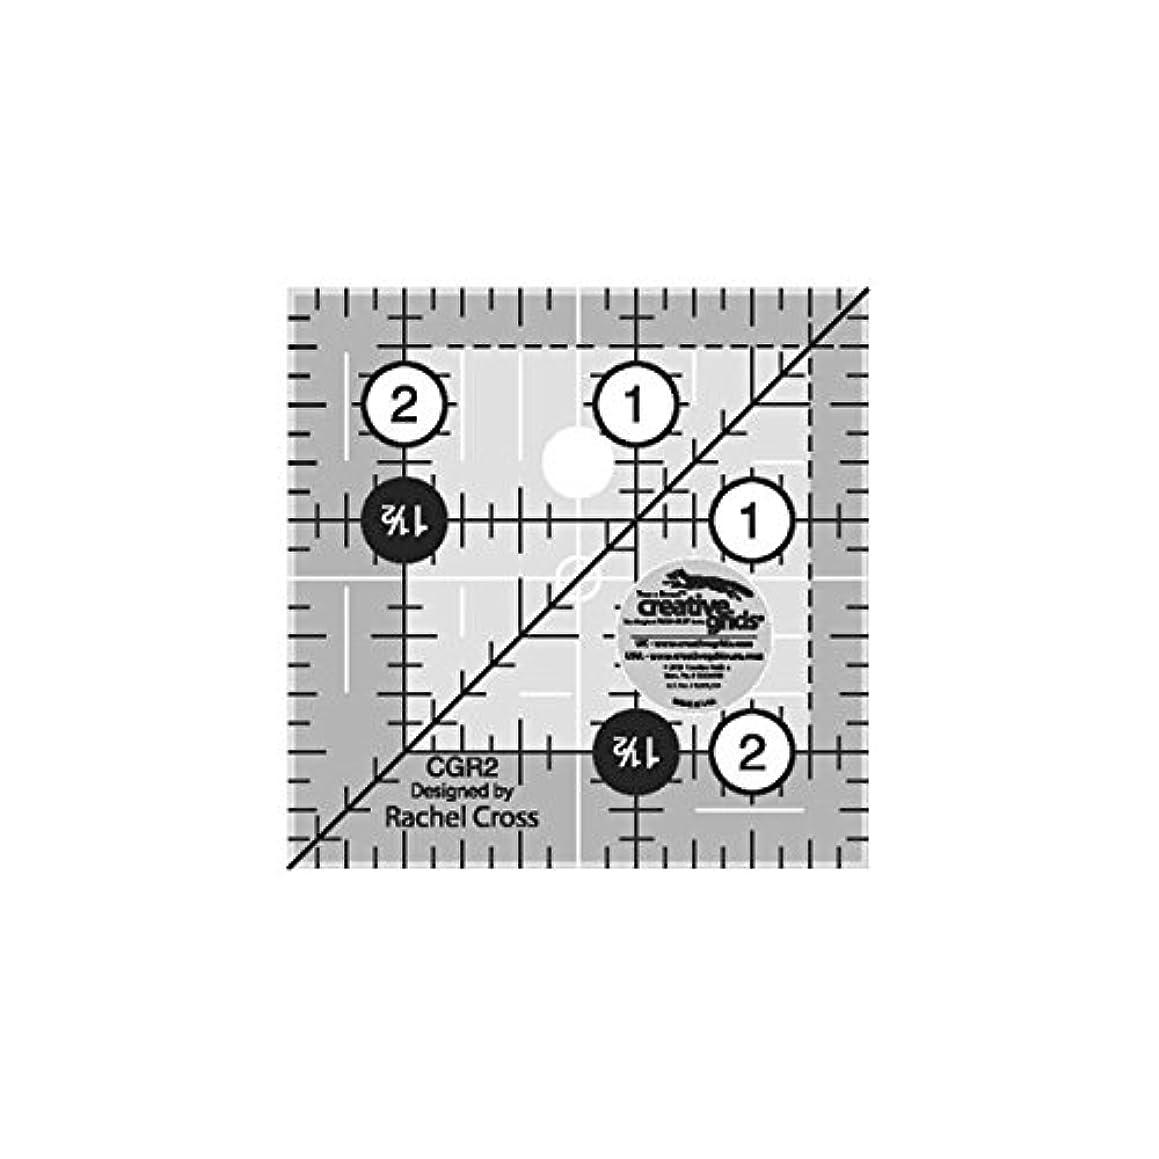 Creative Grids 2.5